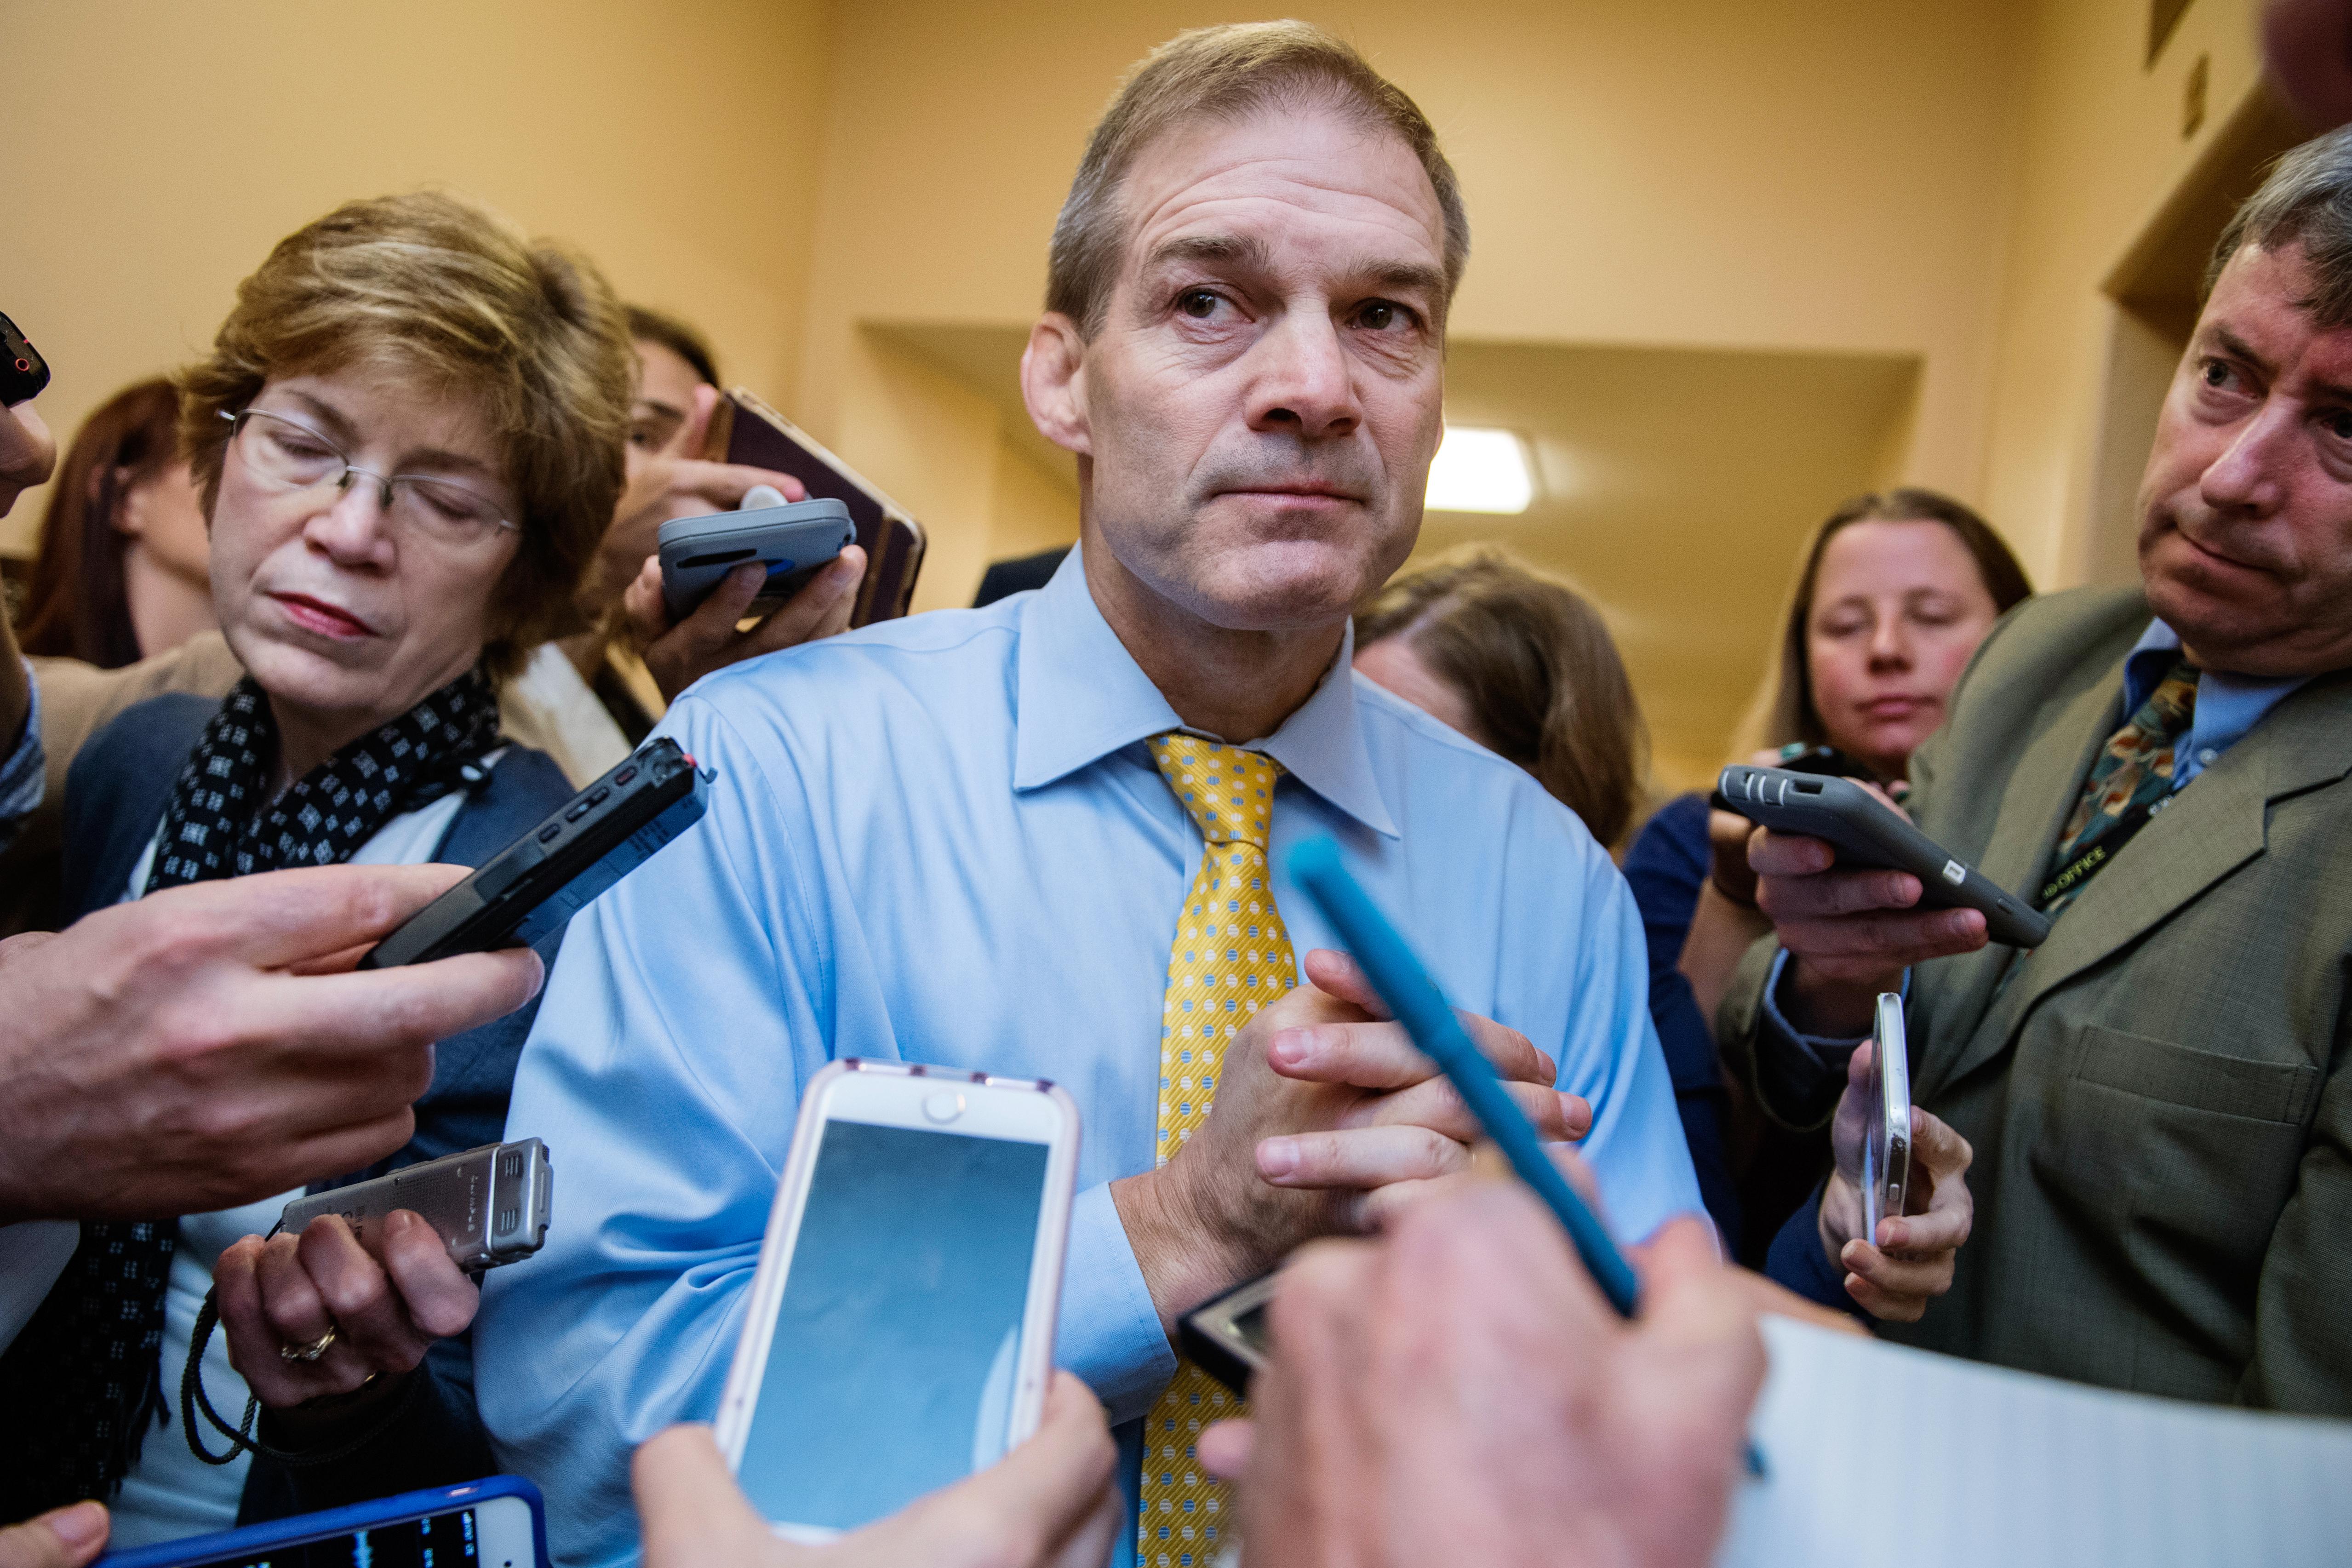 rollingstone.com - Bob Moser - Why Jim Jordan Denies Knowledge of Sexual Abuse at Ohio State